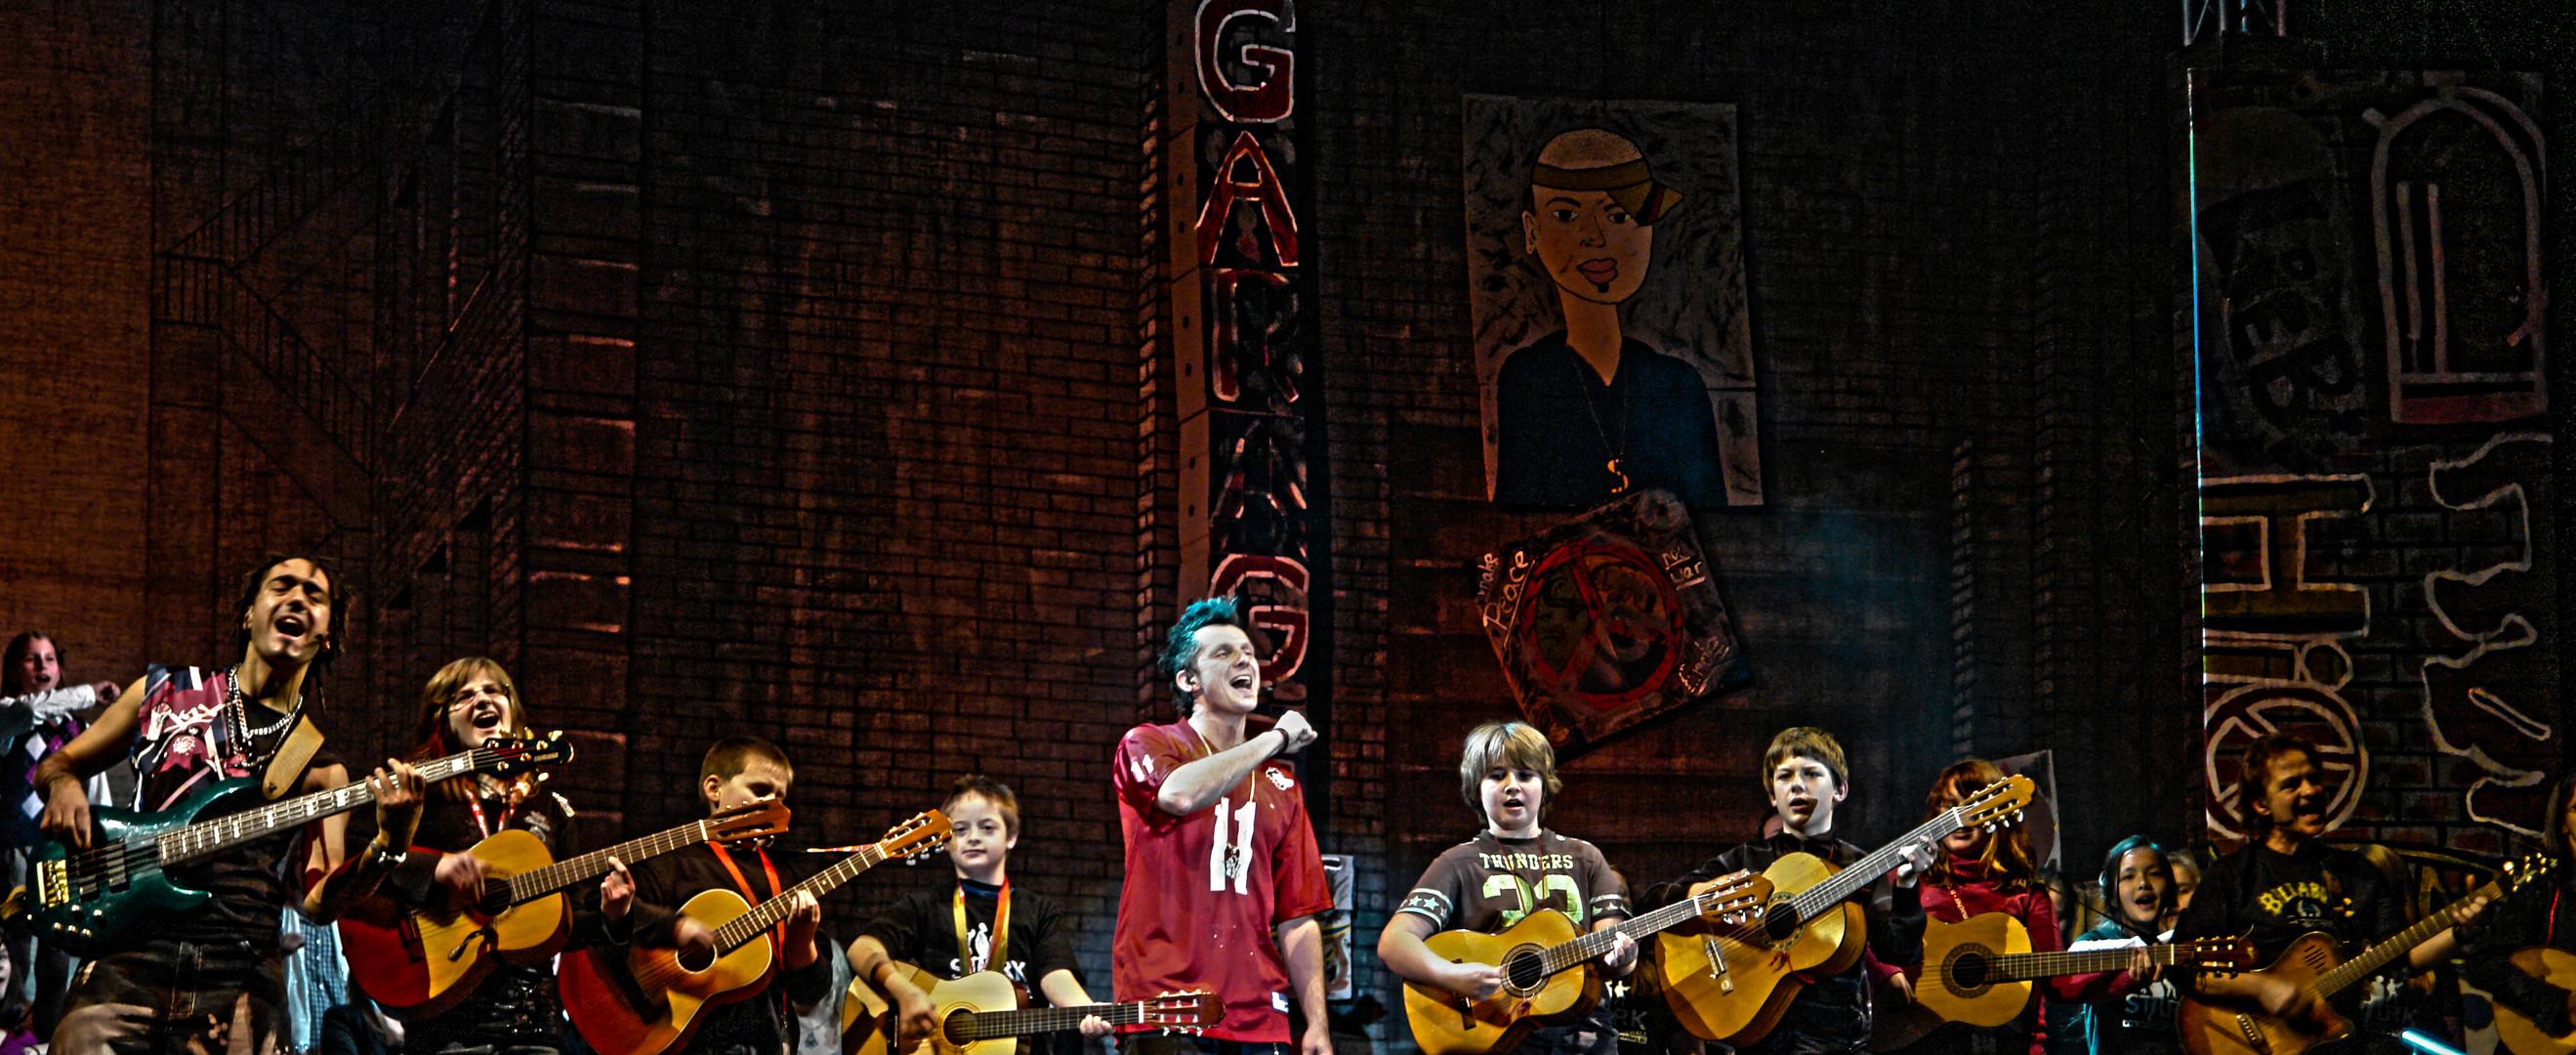 streetligth-the musikal -2-